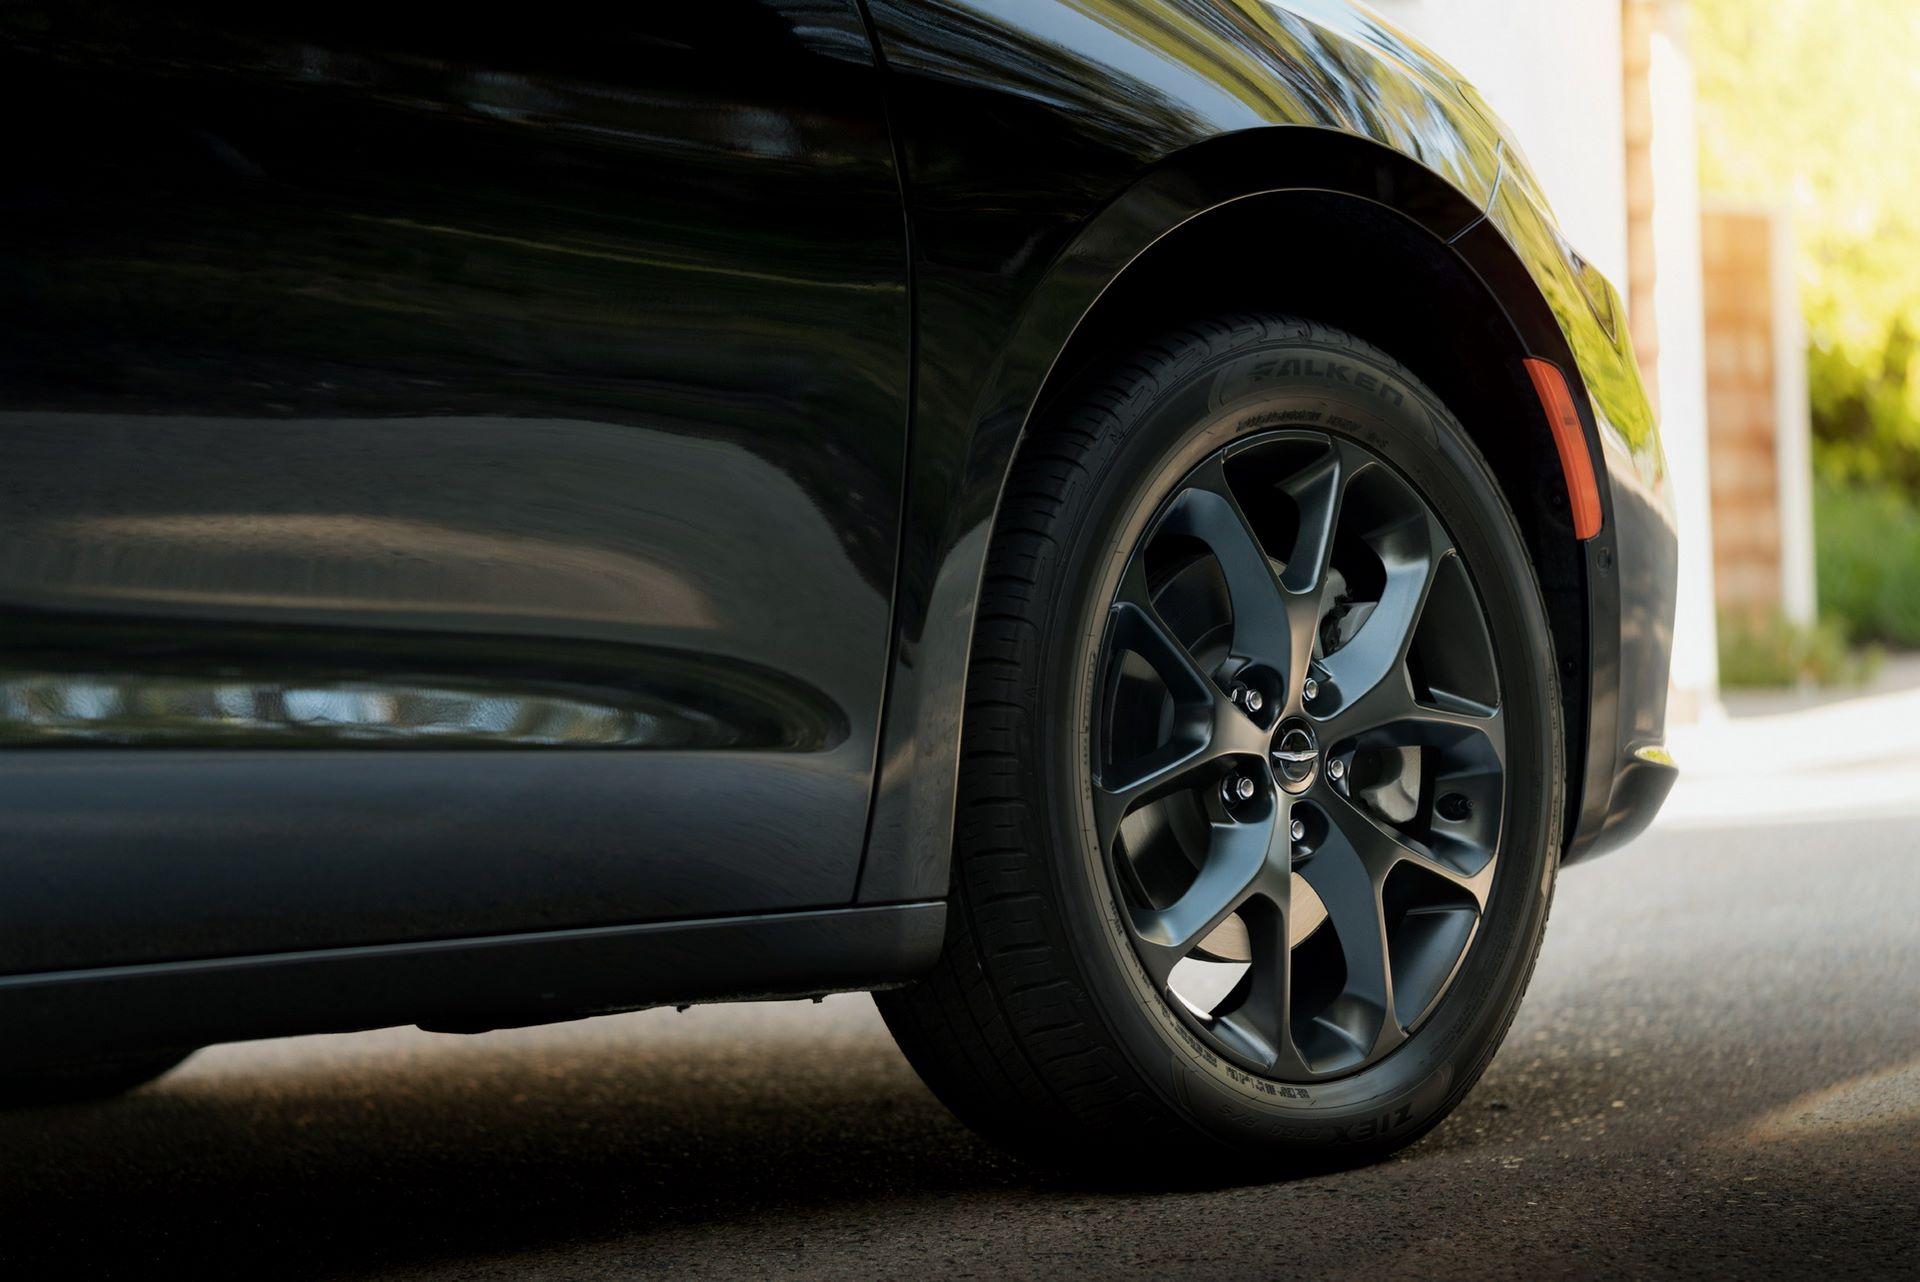 2021-Chrysler-Pacifica-129